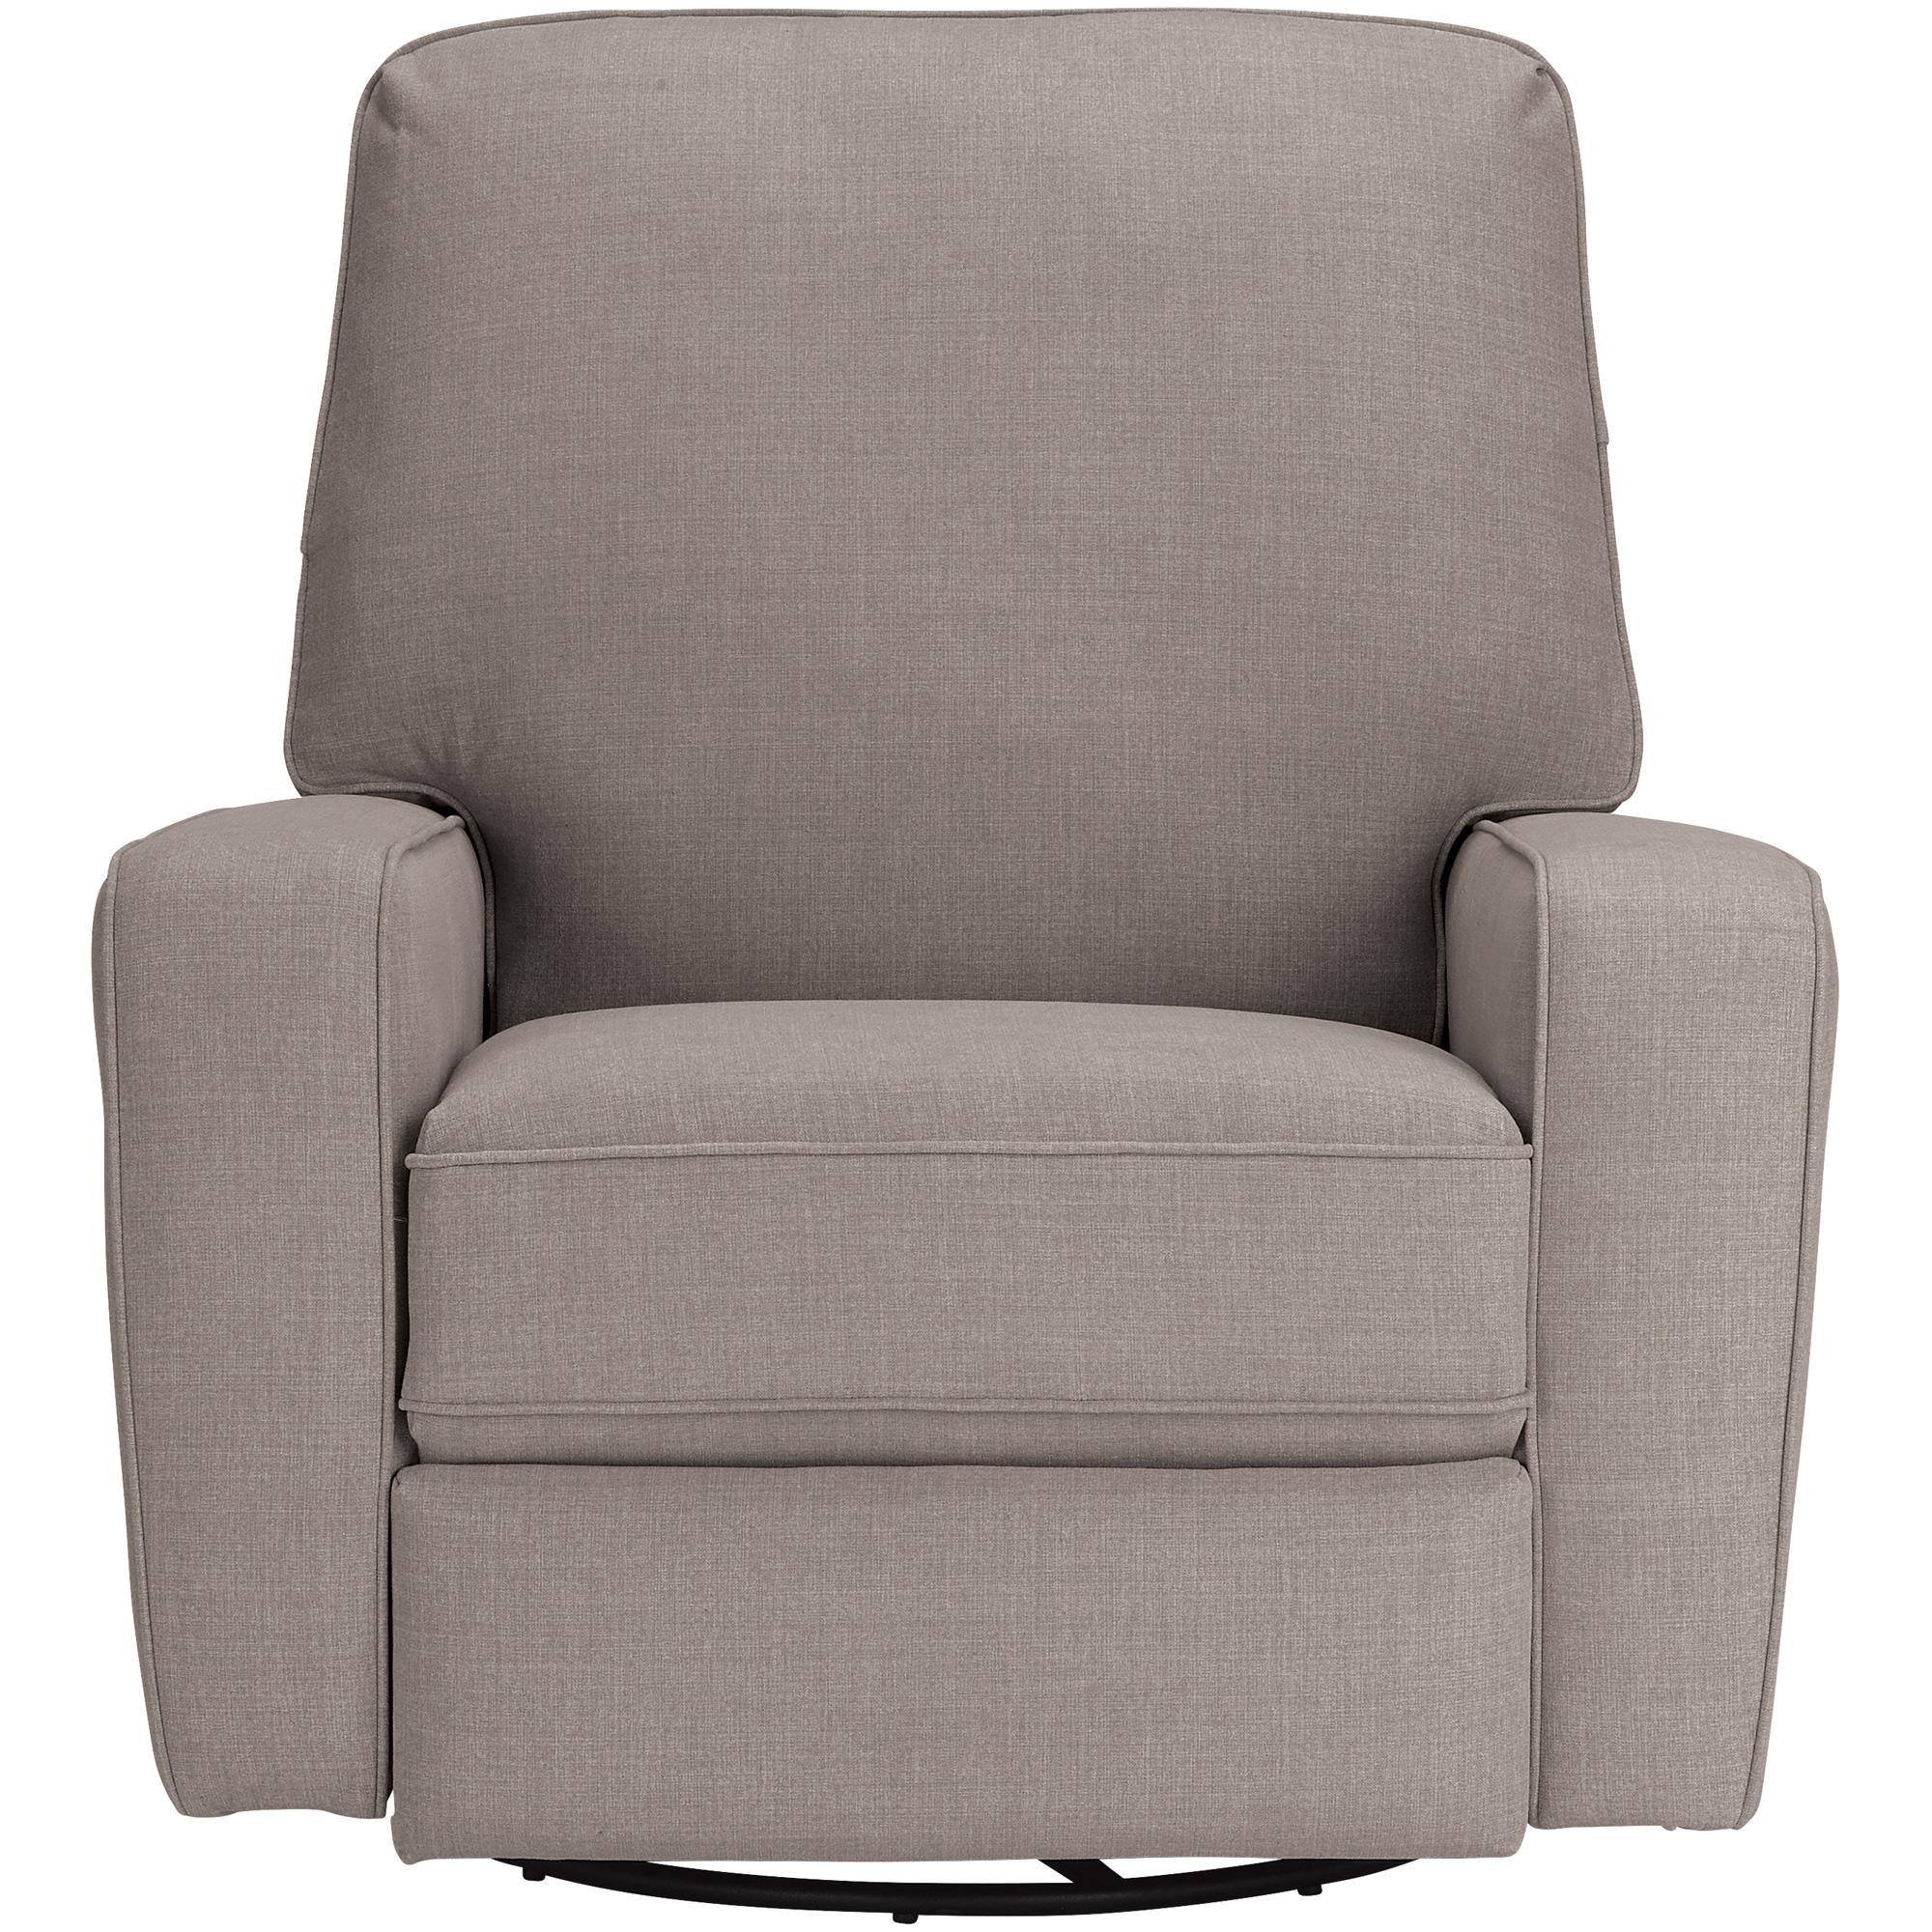 Best Home Furnishings | Bilana Smoke Swivel Glide Recliner Chair